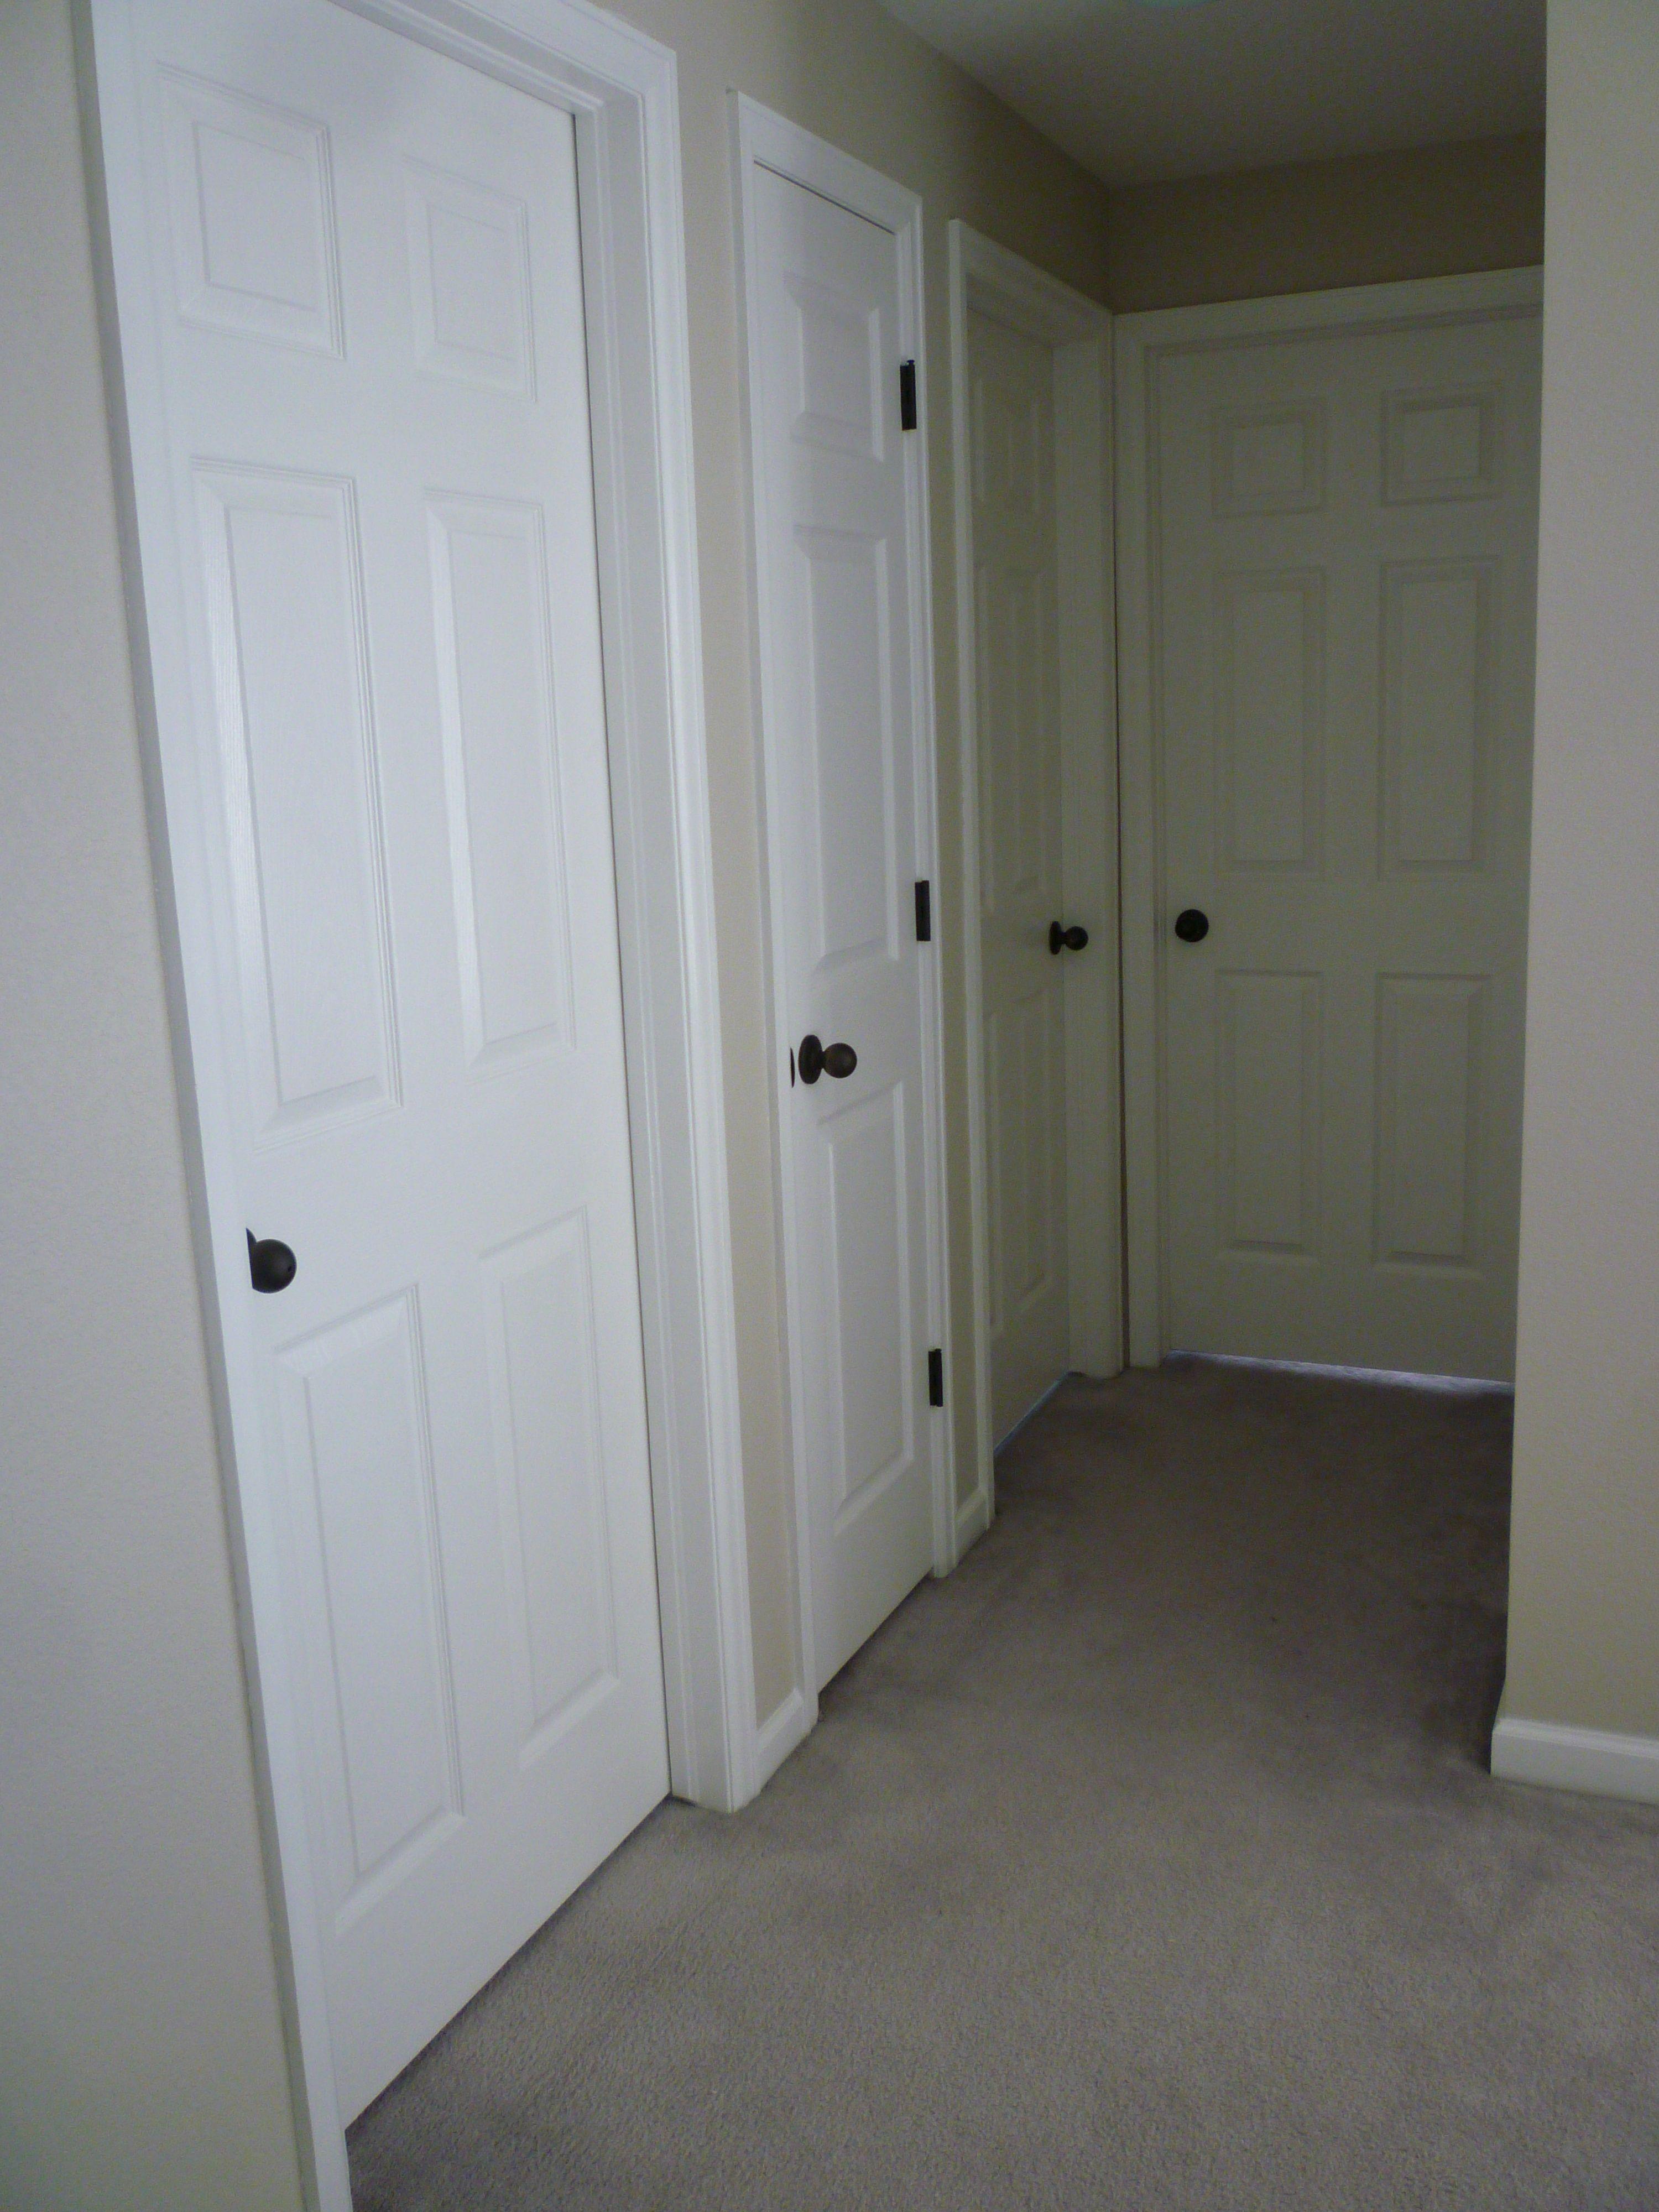 P1070376 Jpg 3 000 4 000 Pixels White Interior Doors Black Interior Doors White Doors